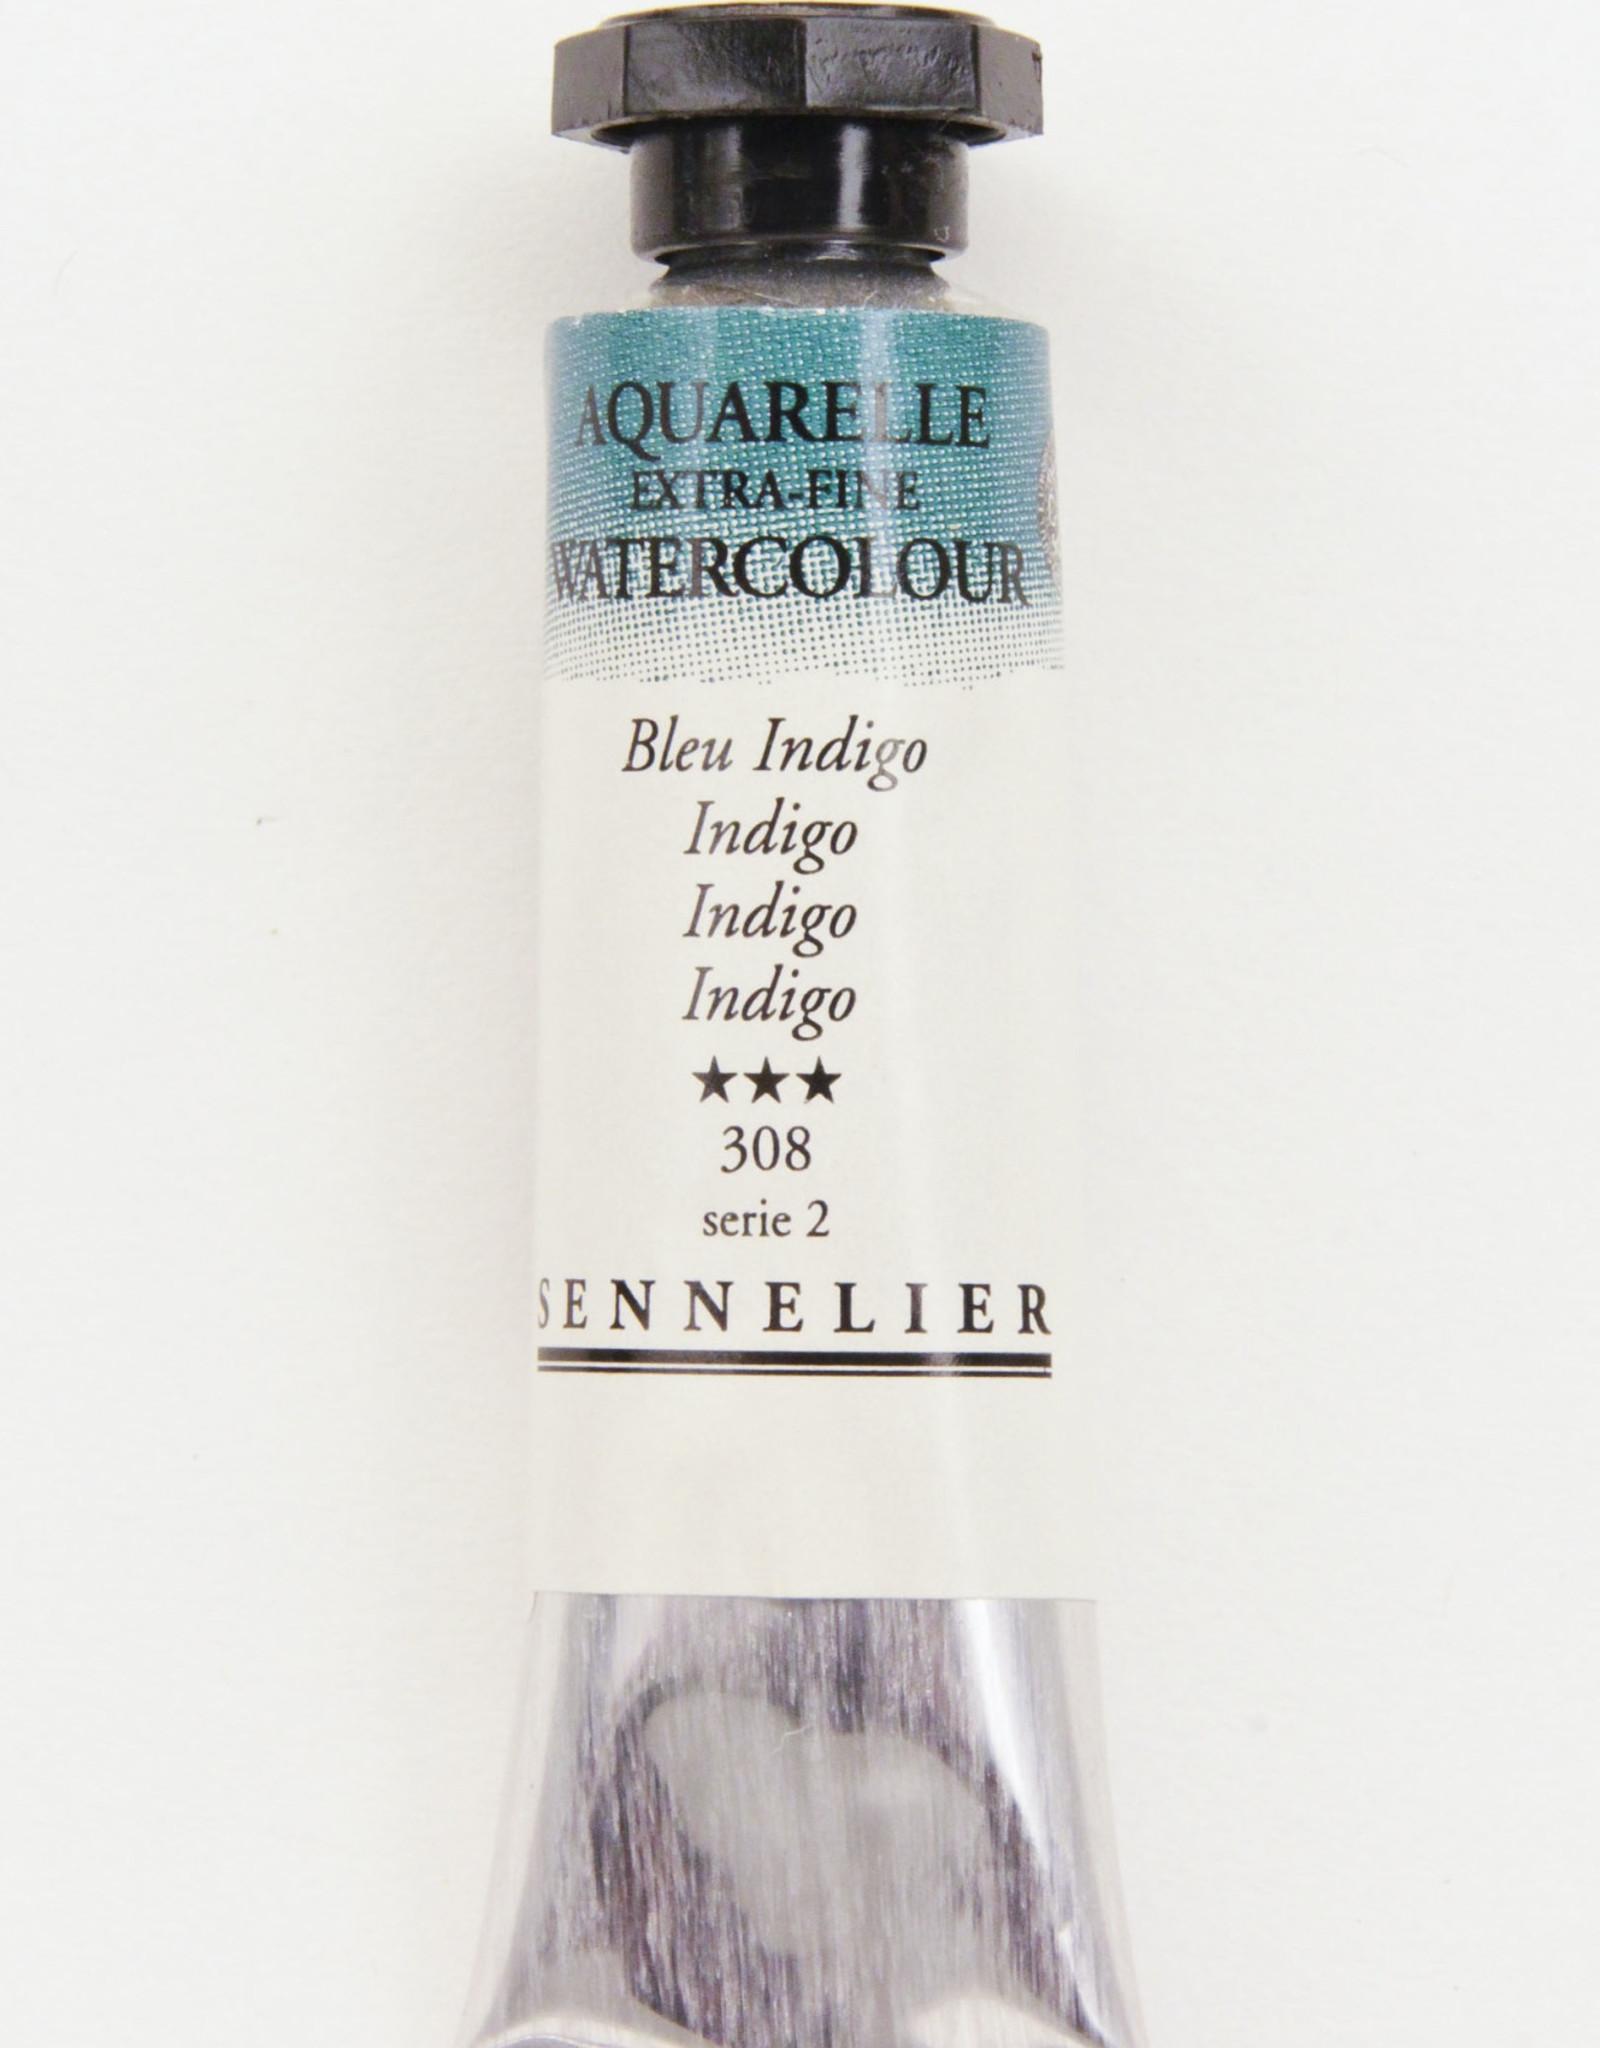 Sennelier, Aquarelle Watercolor Paint, Indigo, 308,10ml Tube, Series 2